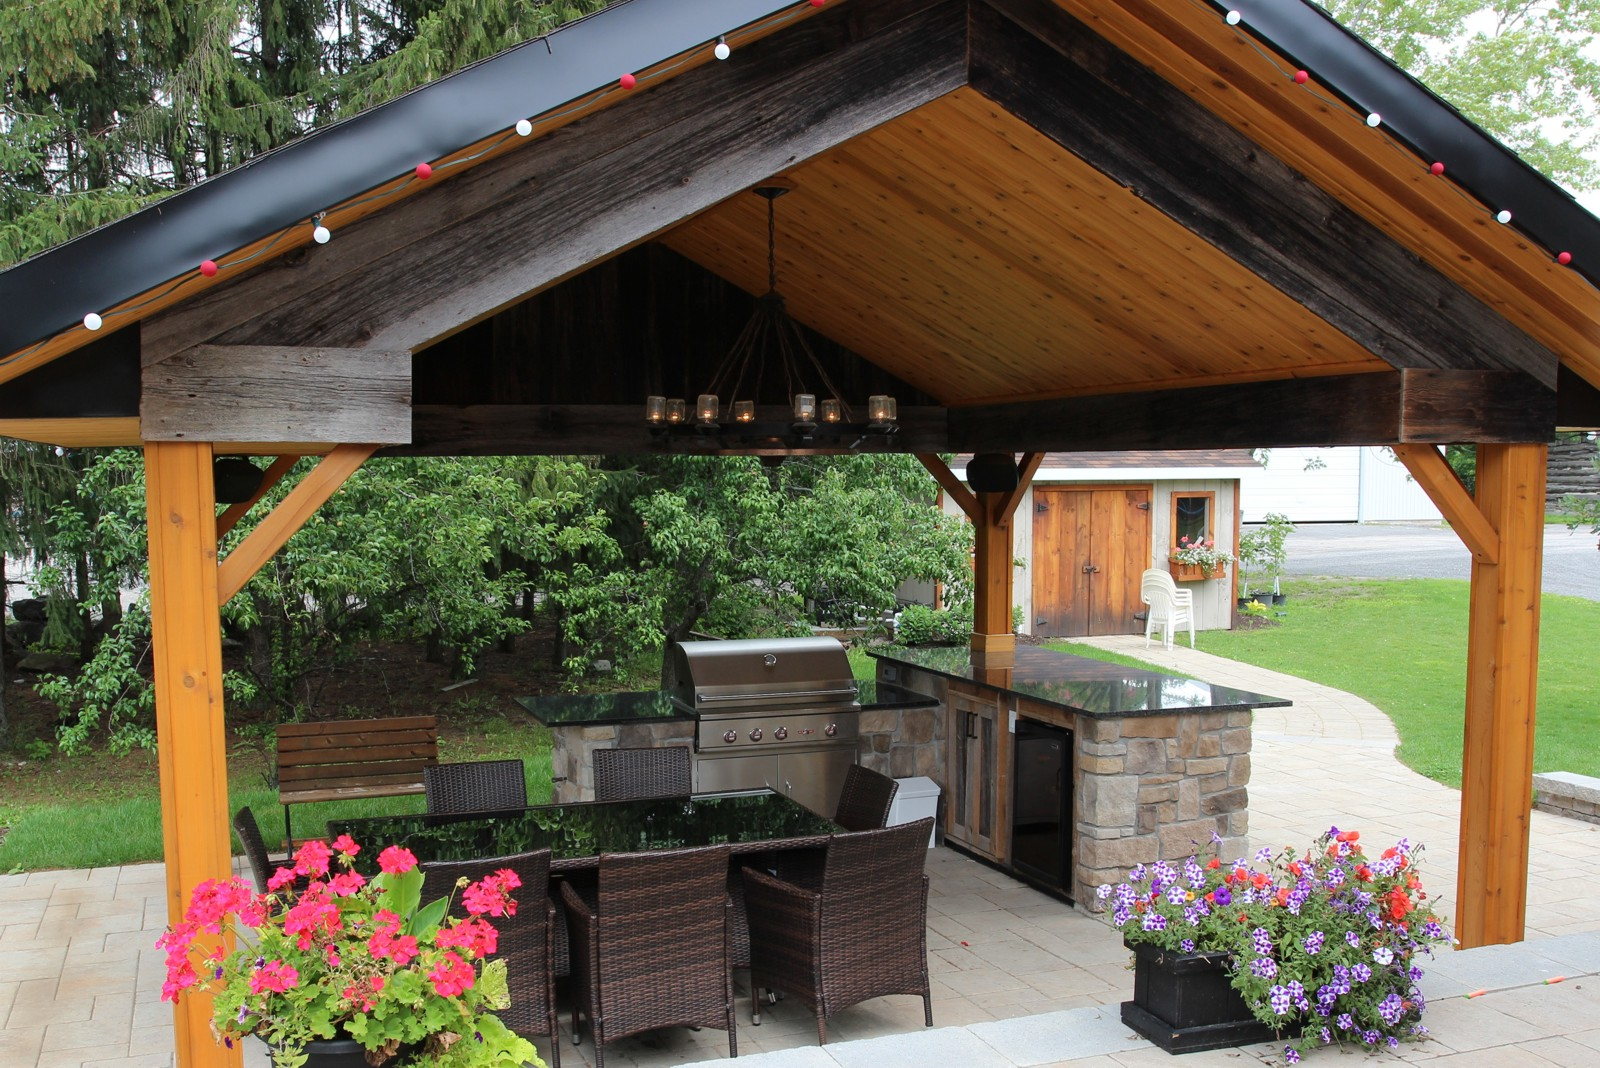 Backyard Retreats - Ideas for Your Home on Backyard Retreat Ideas id=51235